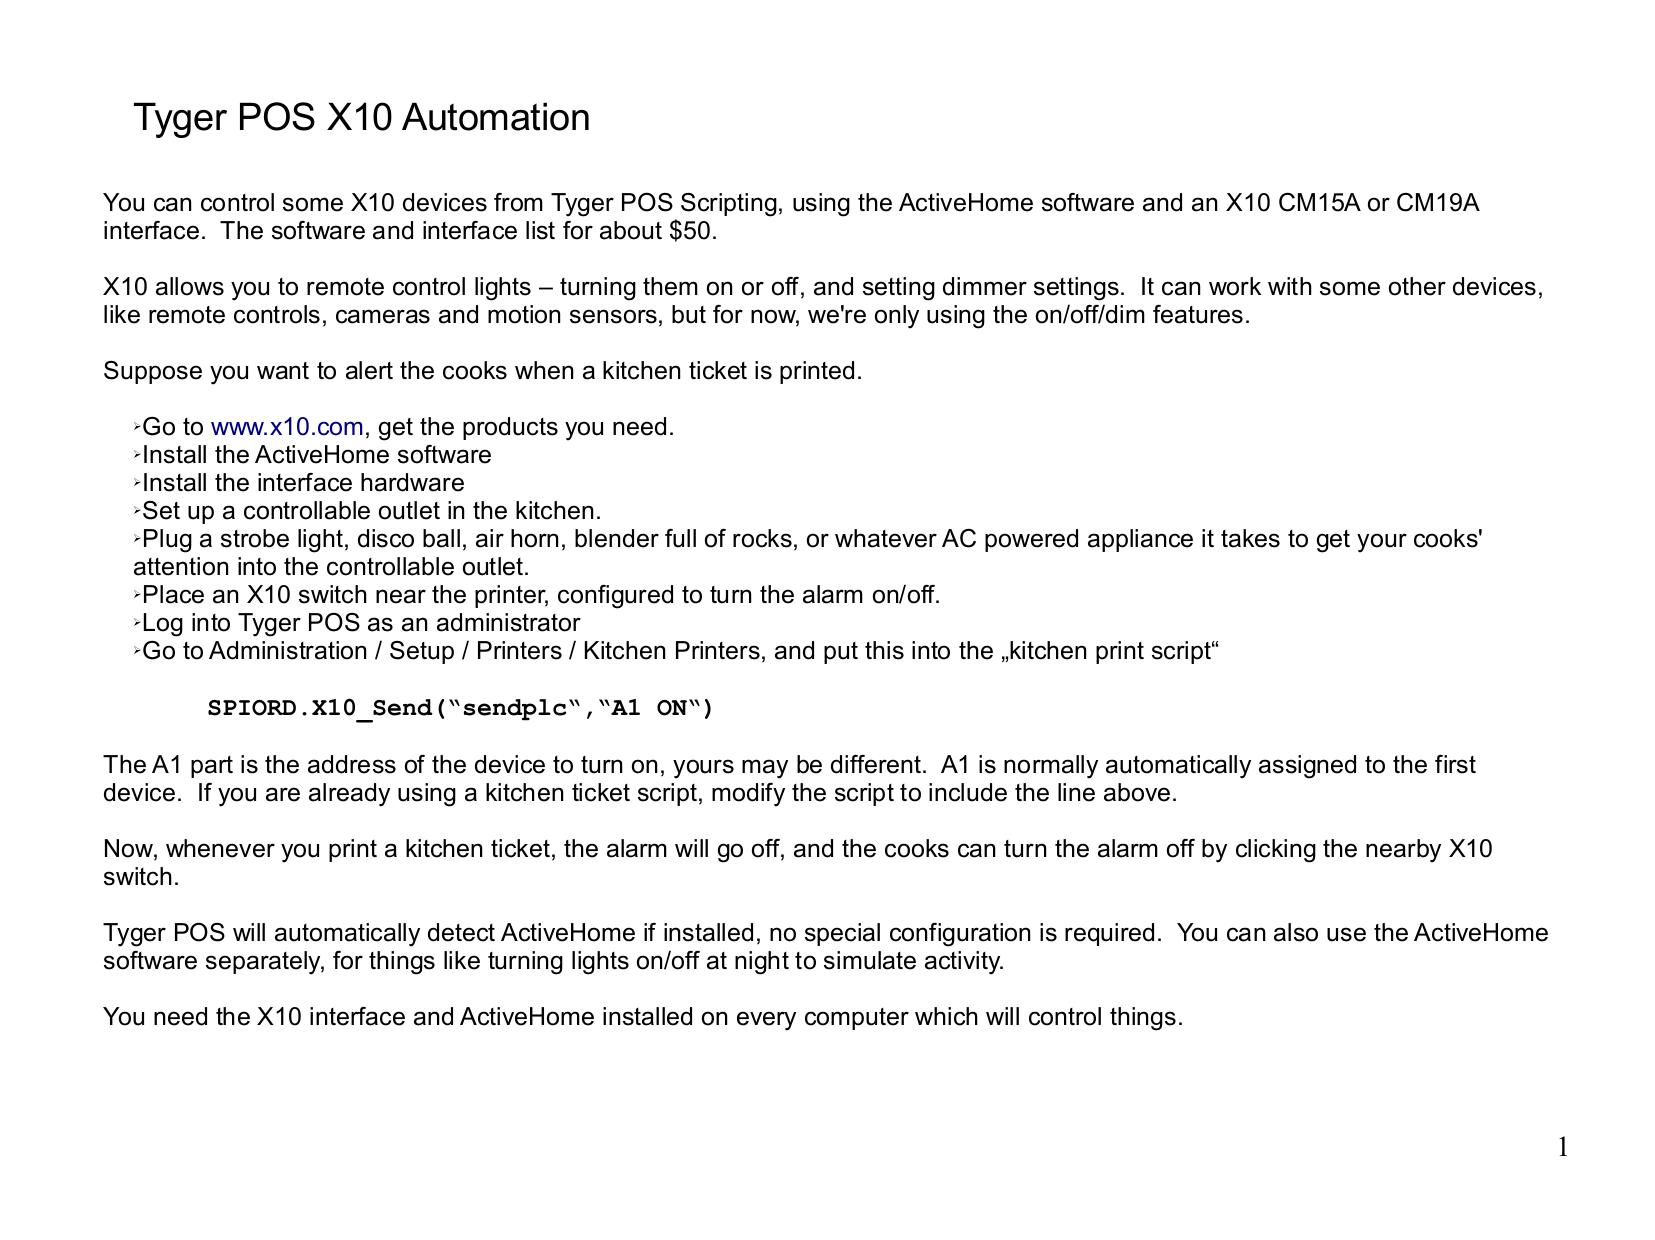 pdf for X10 Remote Control CM19A manual